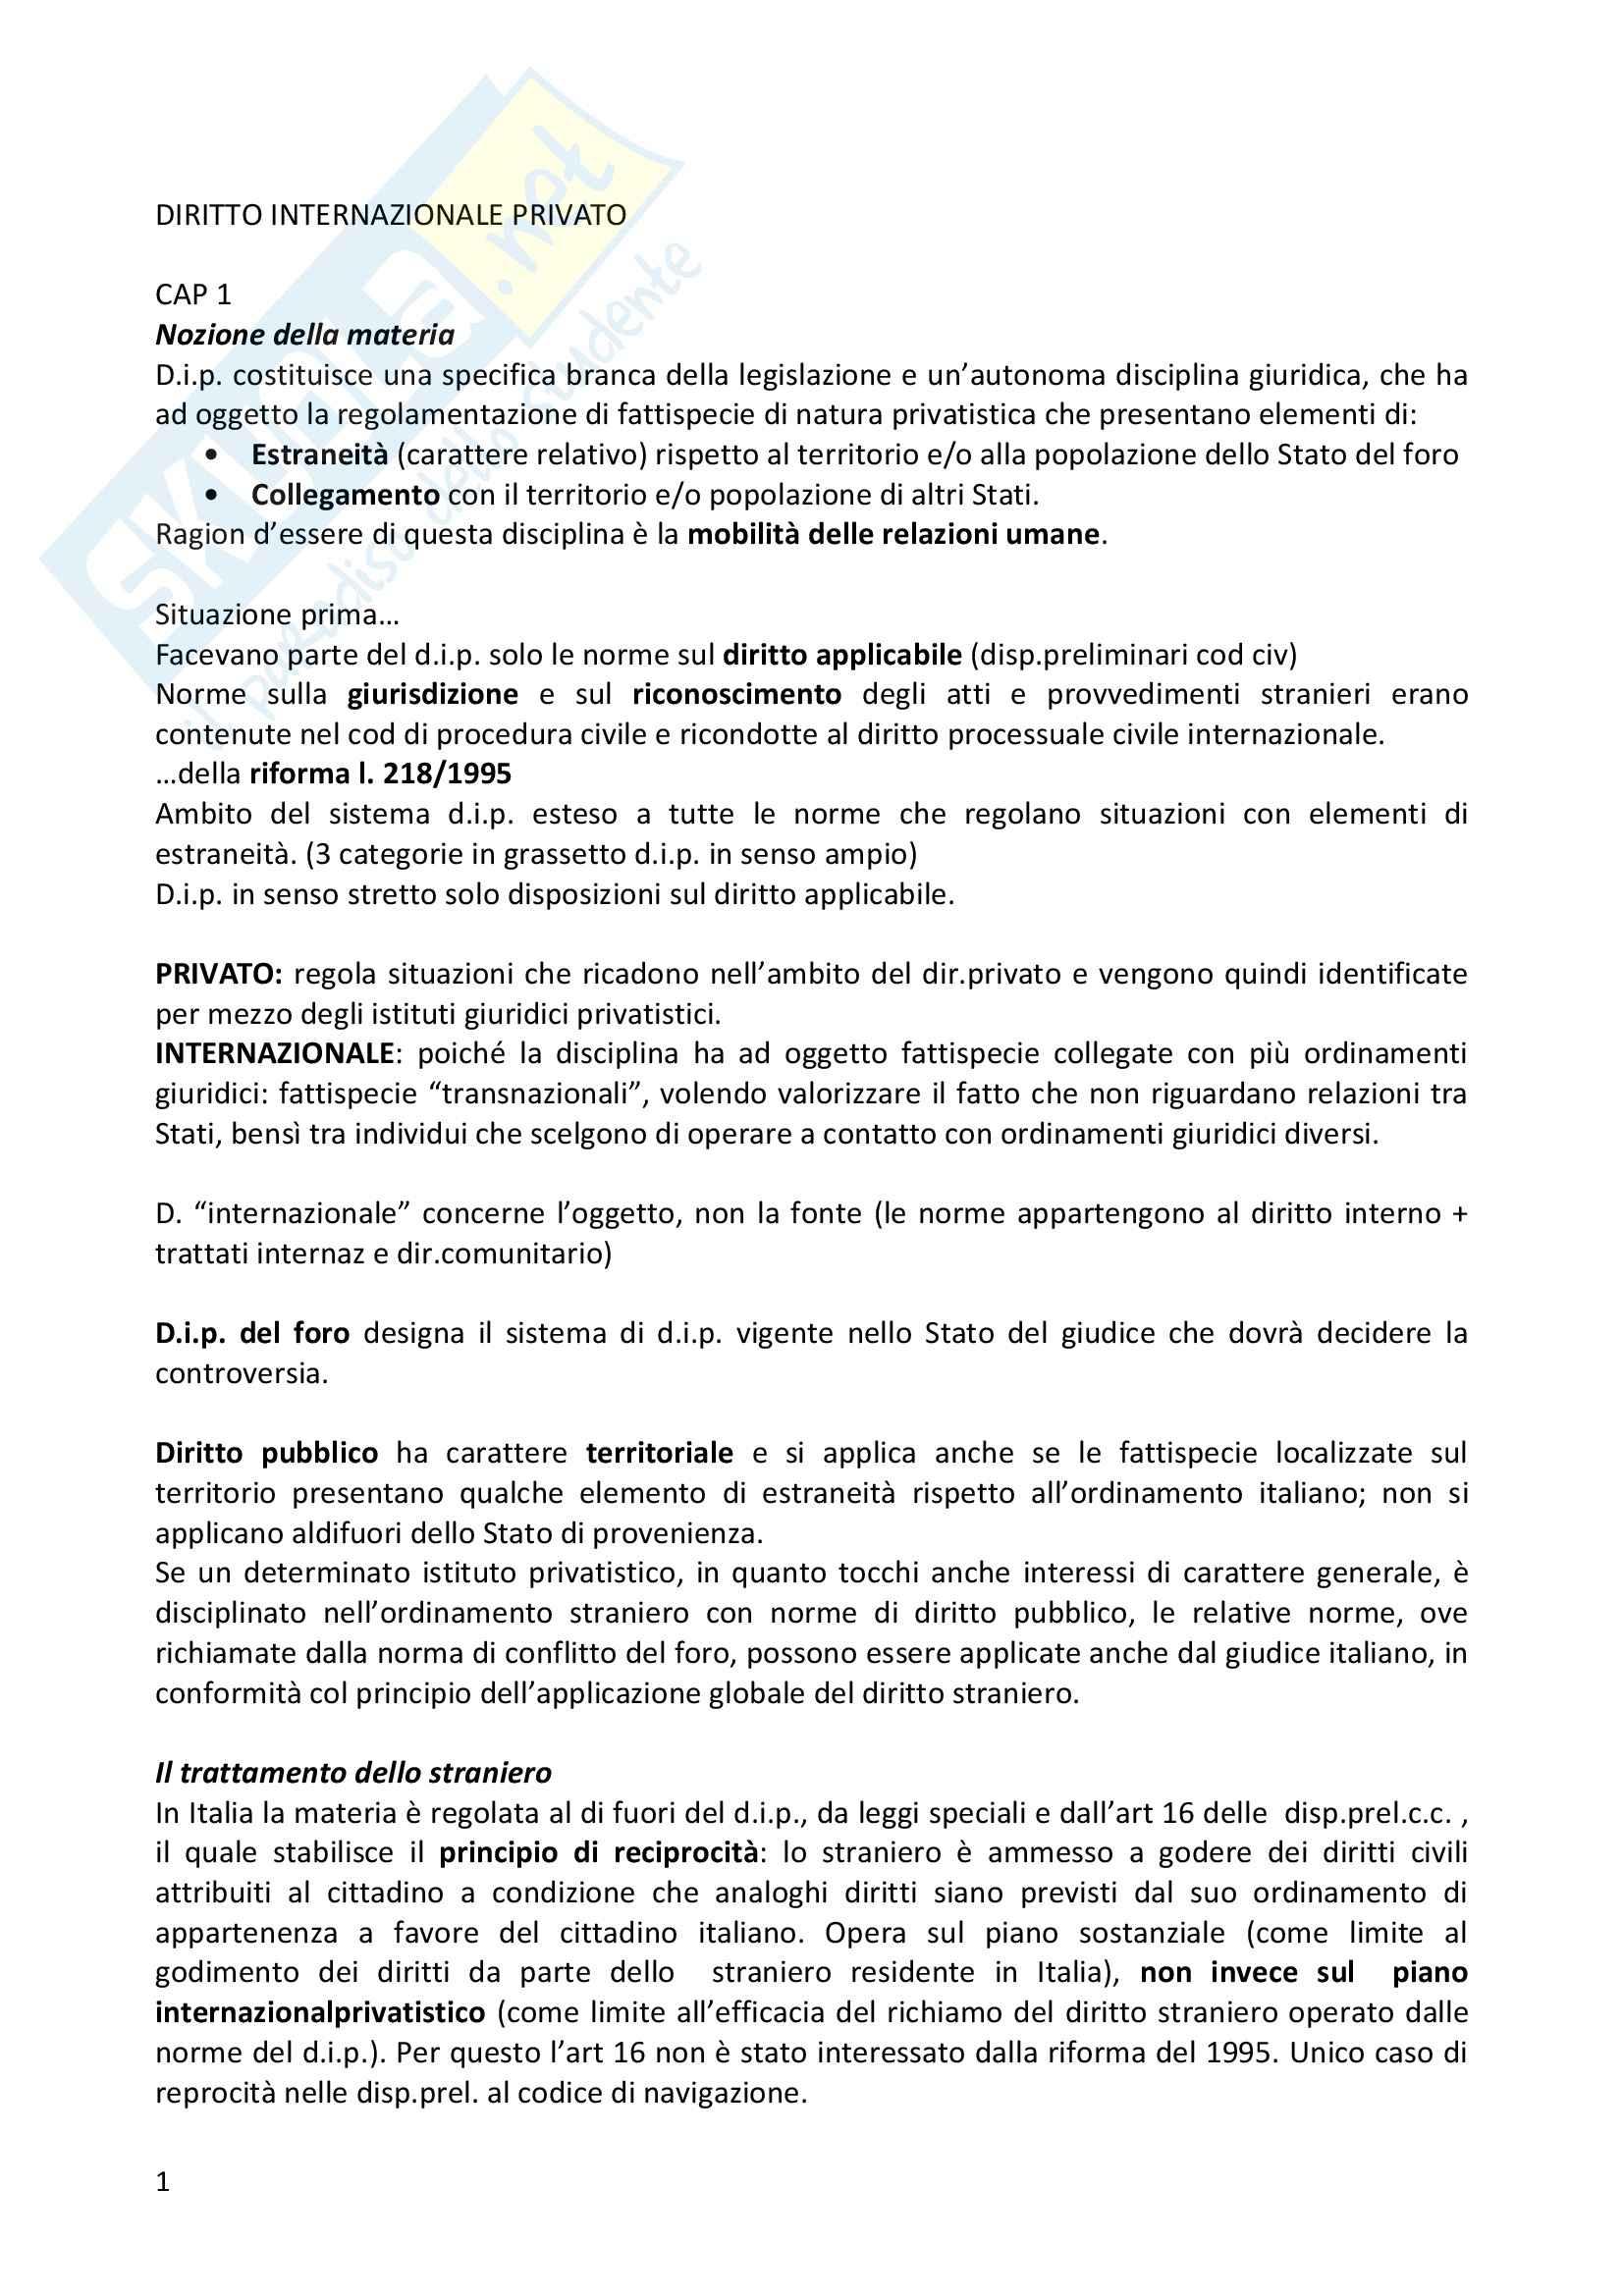 Diritto internazionale - Riassunto esame, prof. Amadeo